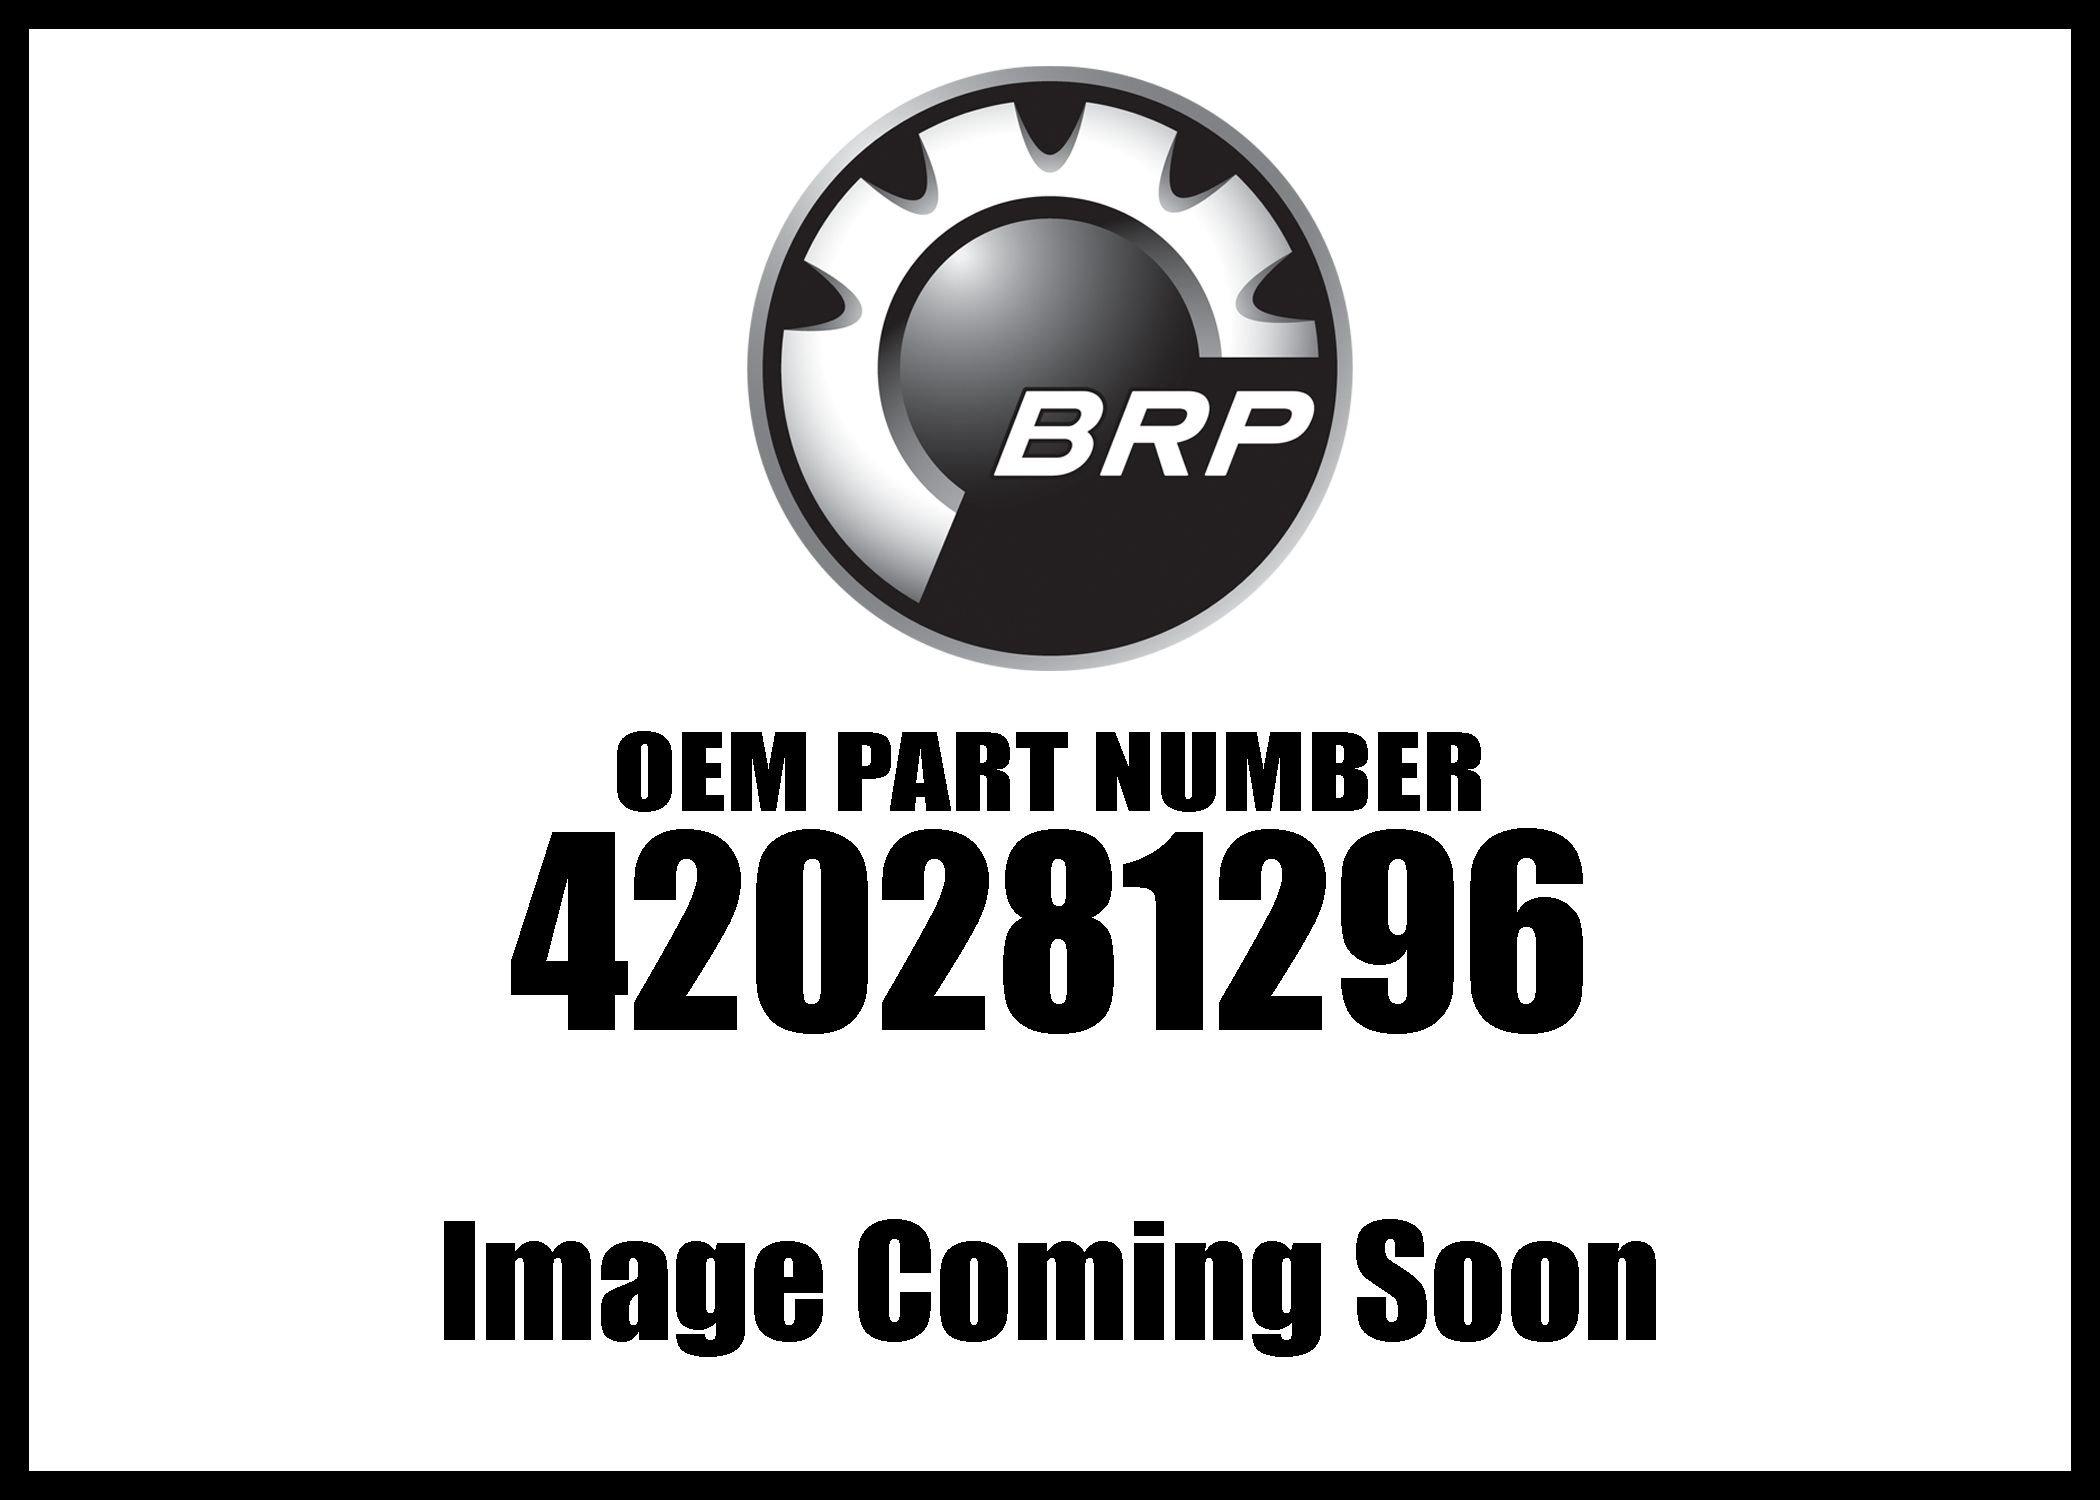 Can-Am Slider Shoe Set 1 Set= 12Pc 420281296 New OEM